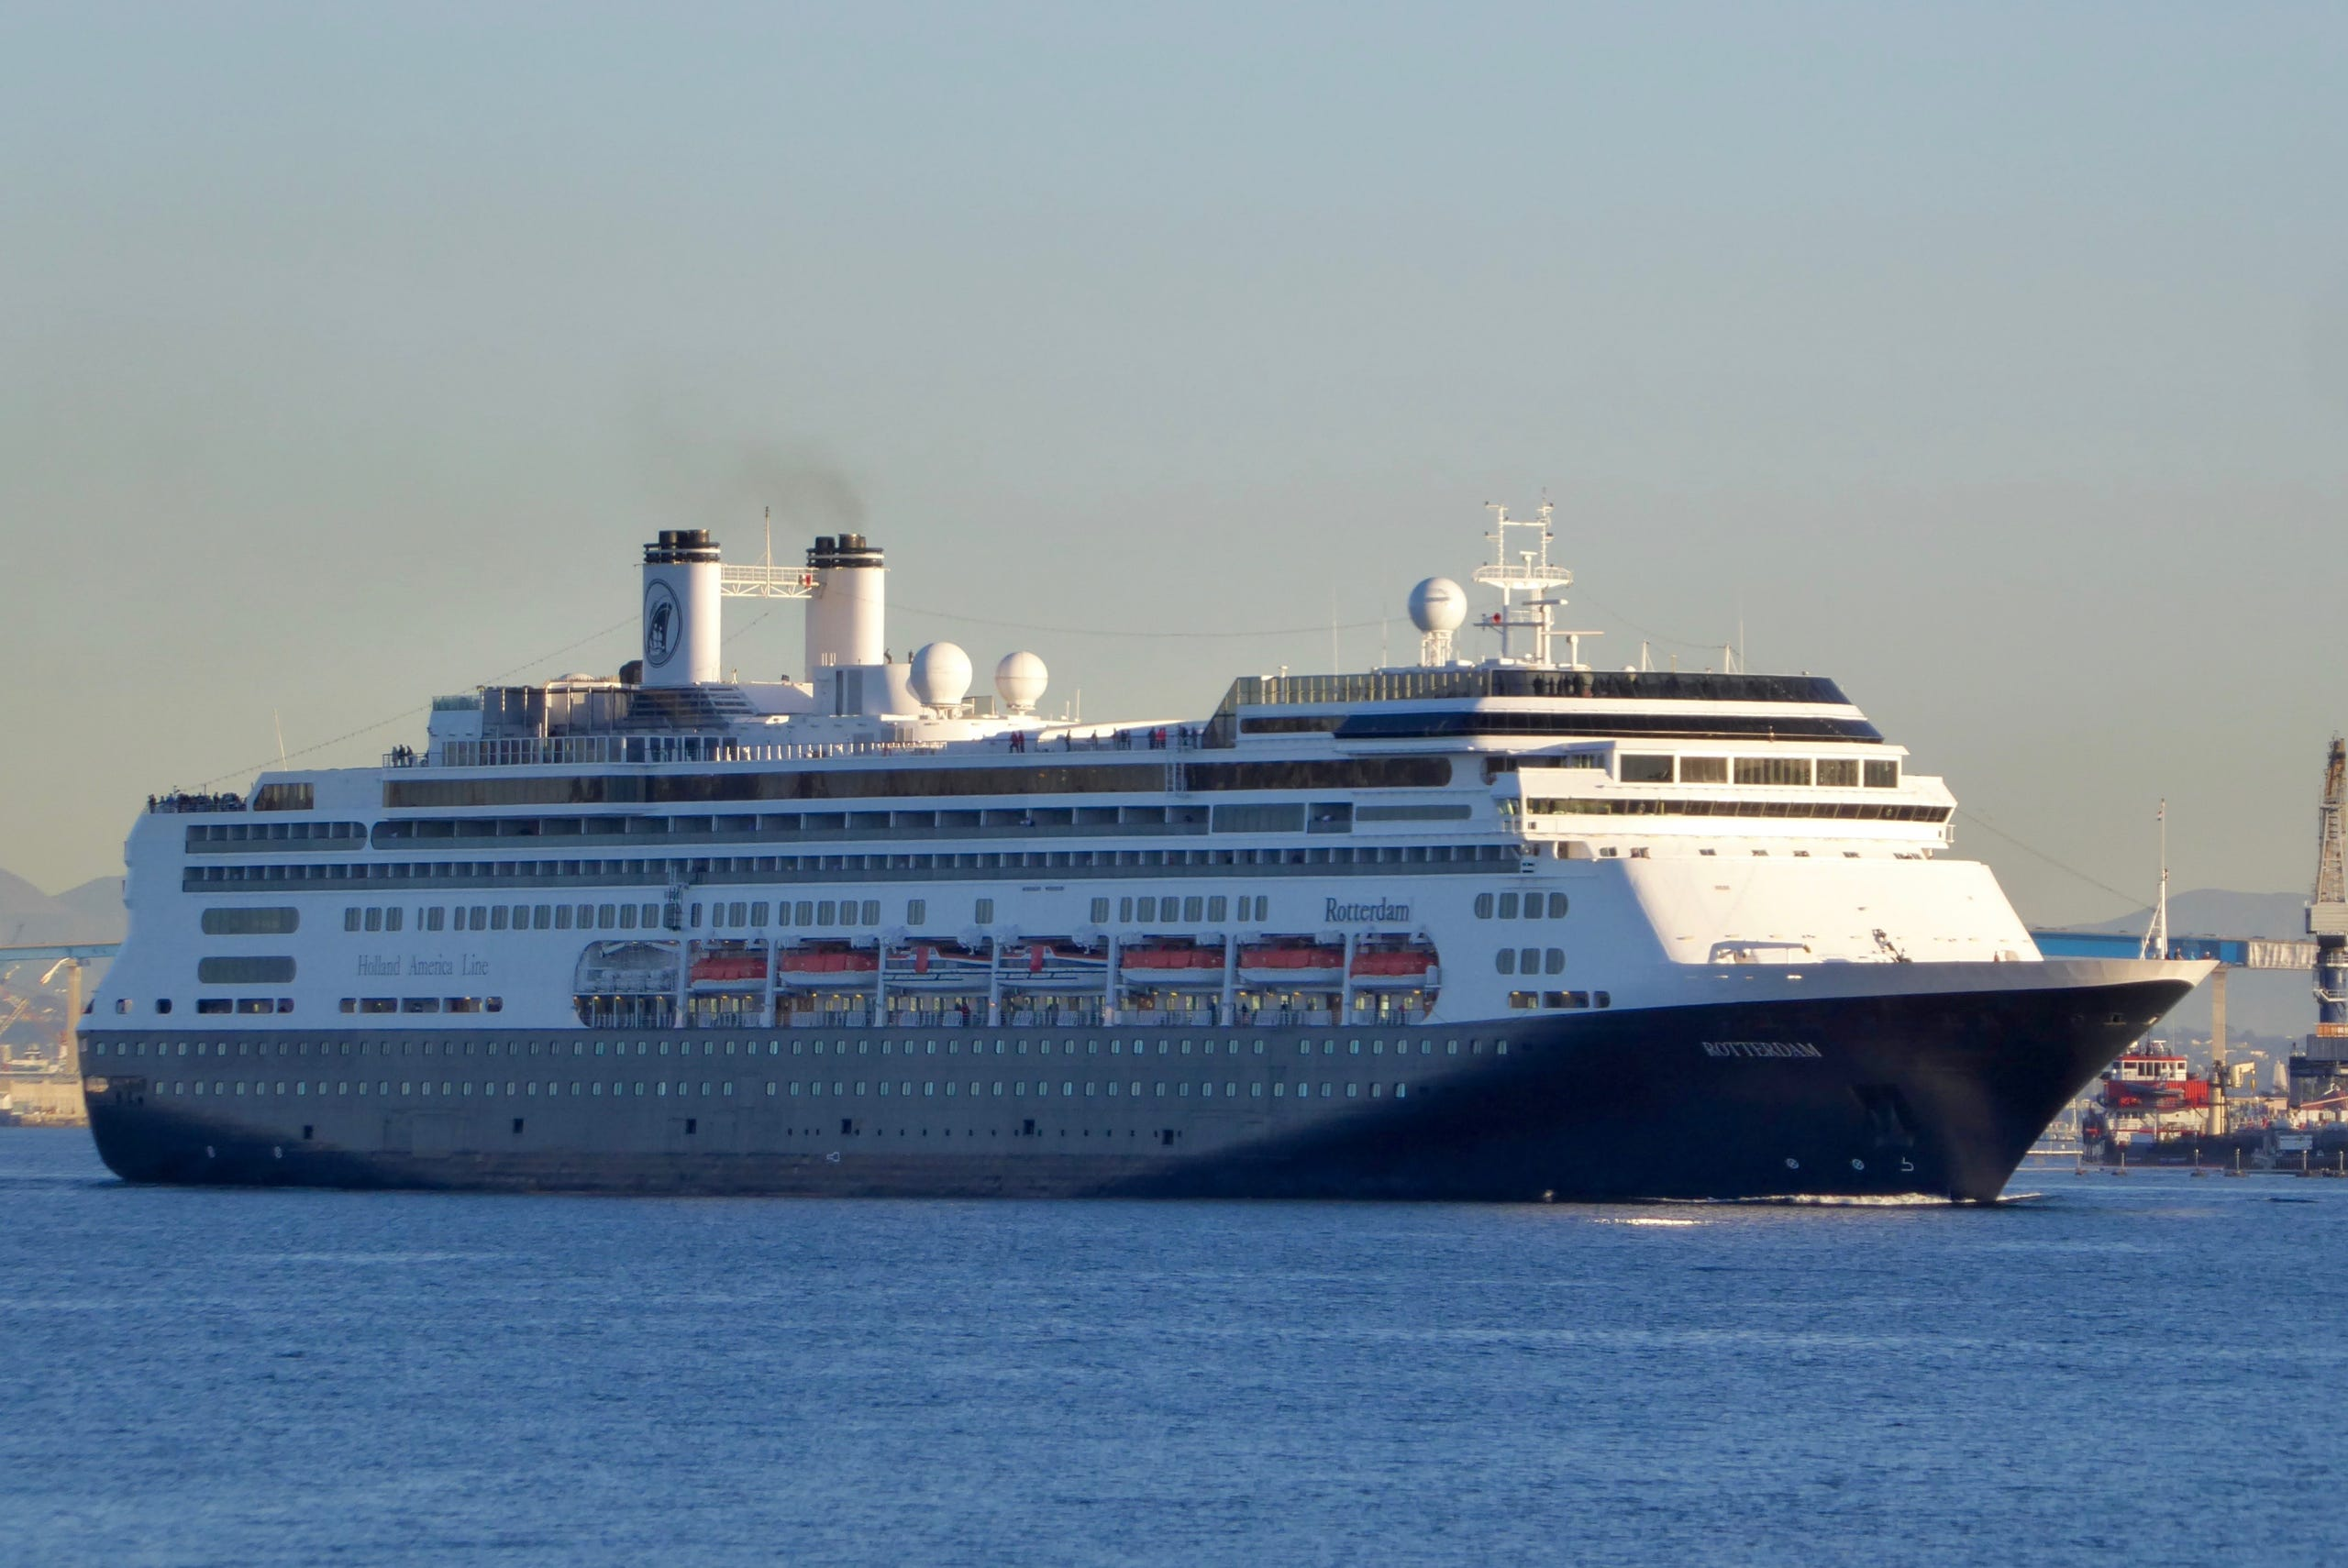 Cruise ship tours: Holland America's Rotterdam